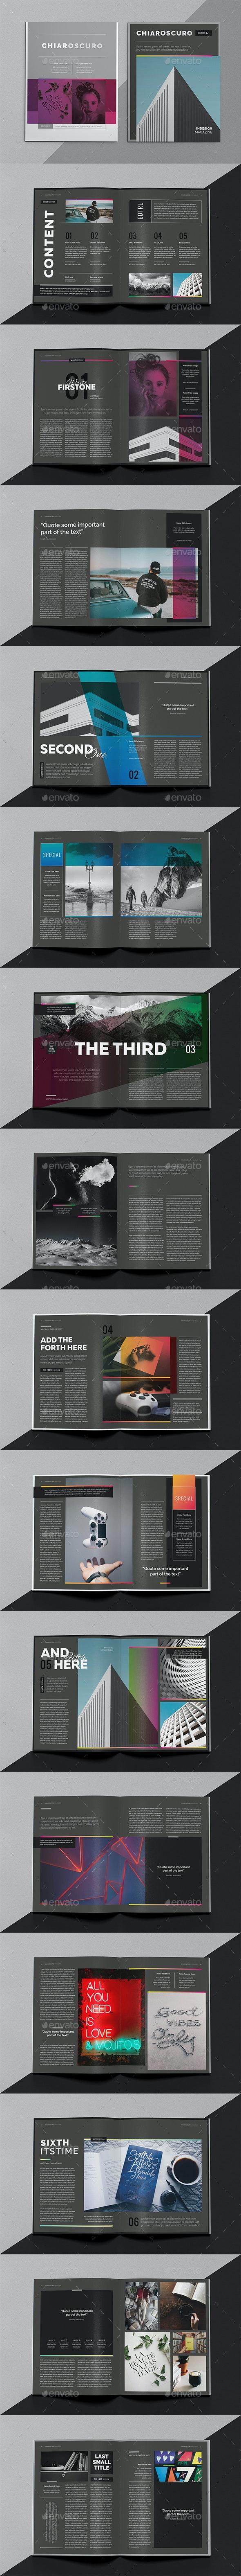 Chiaroscuro Magazine Template - Magazines Print Templates